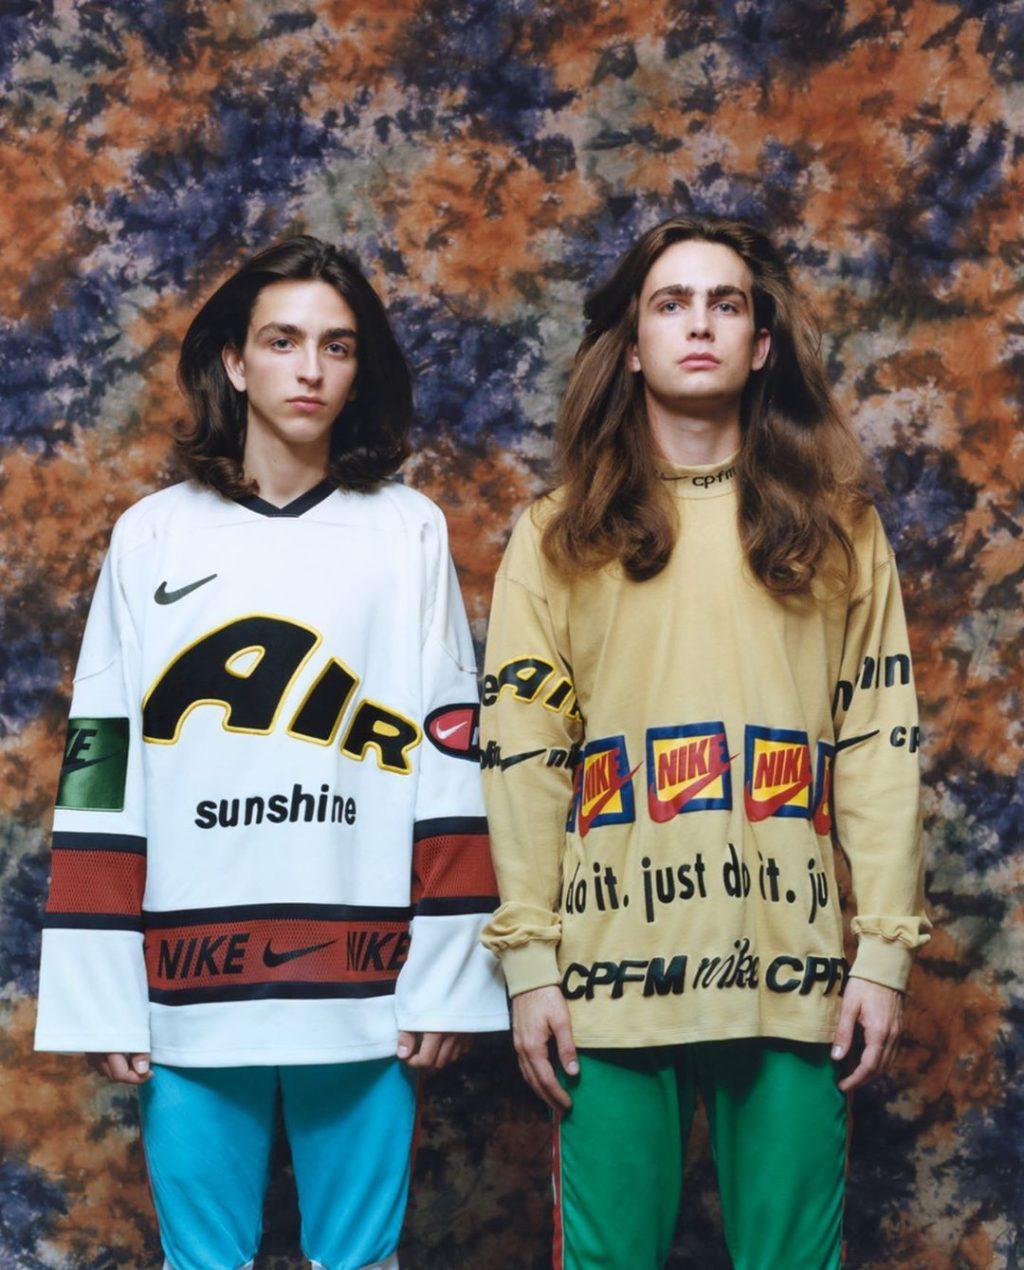 cactus-plant-flea-market-nike-apparel